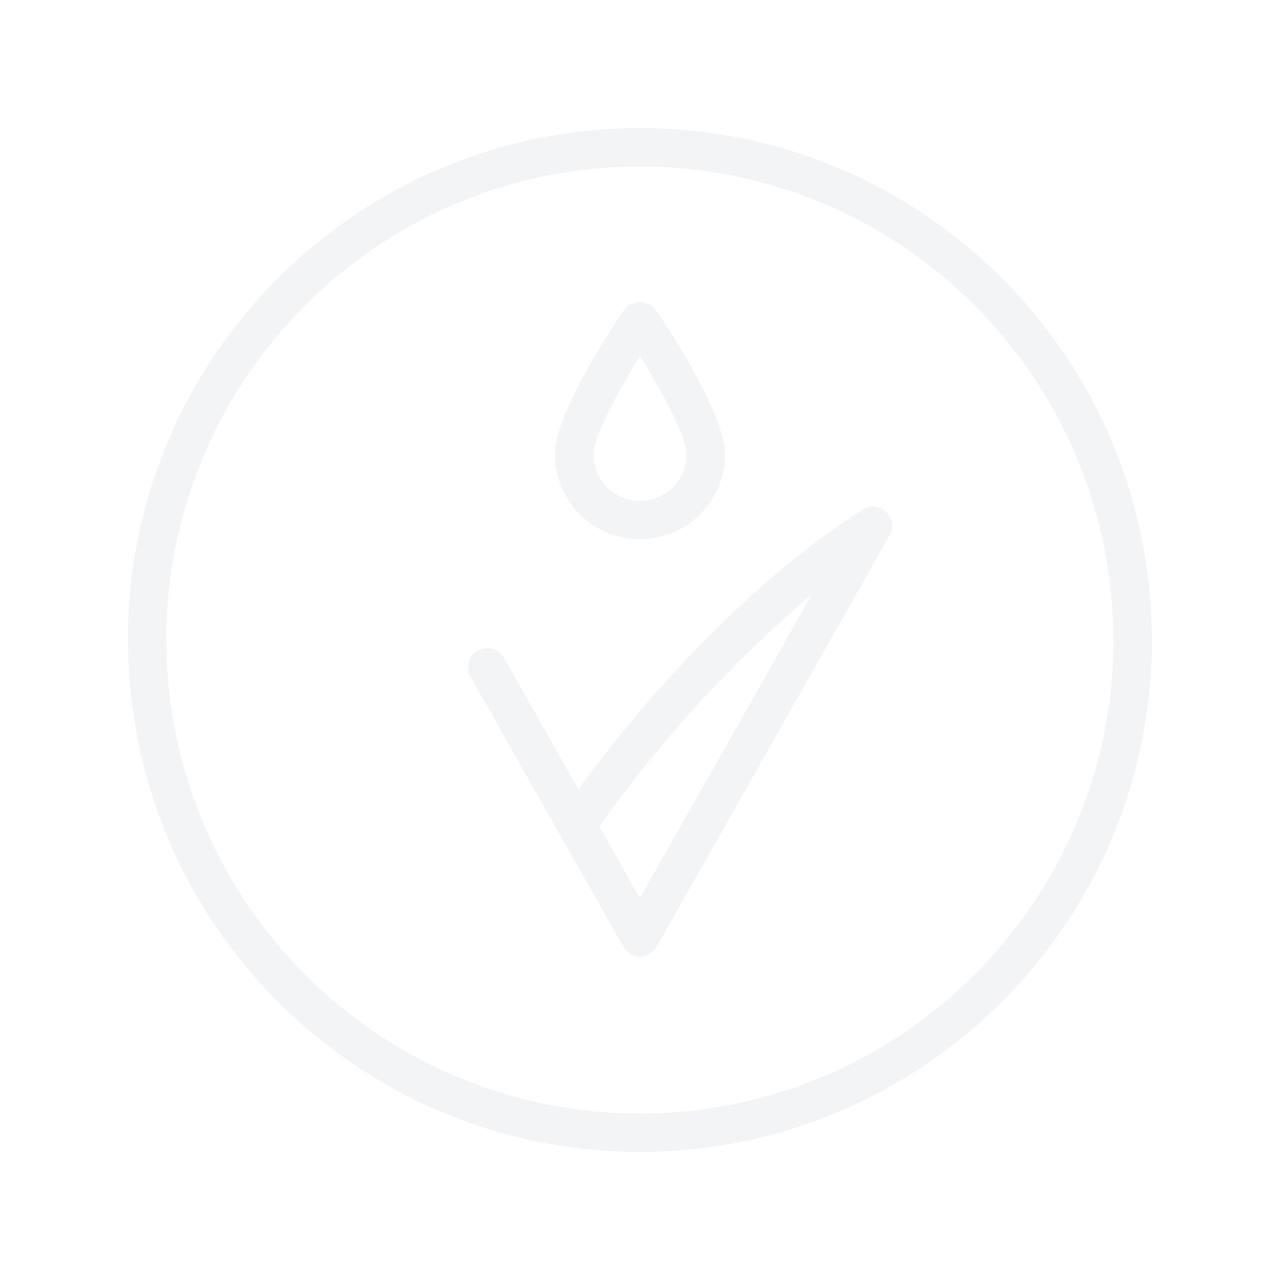 E.L.F. Brush Cleanser Wipes 10pcs чистящие салфетки для кистей